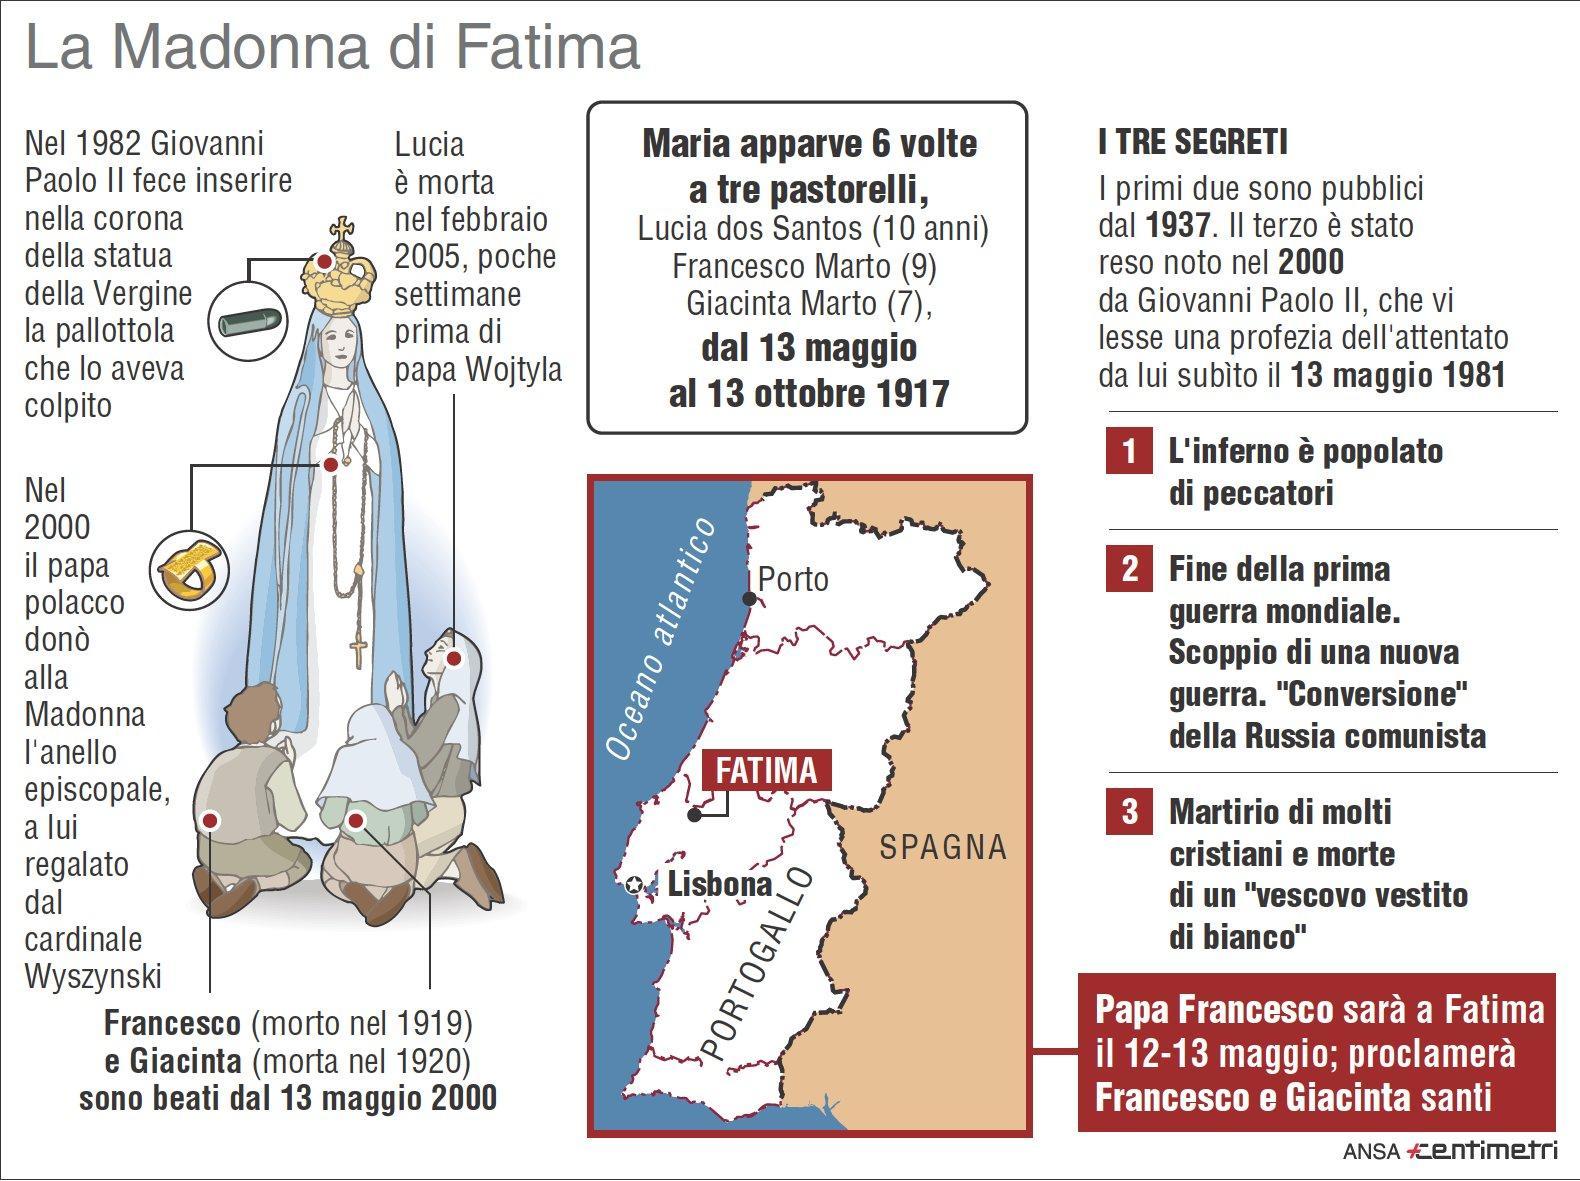 Papa Francesco fa santi i pastorelli di Fatima